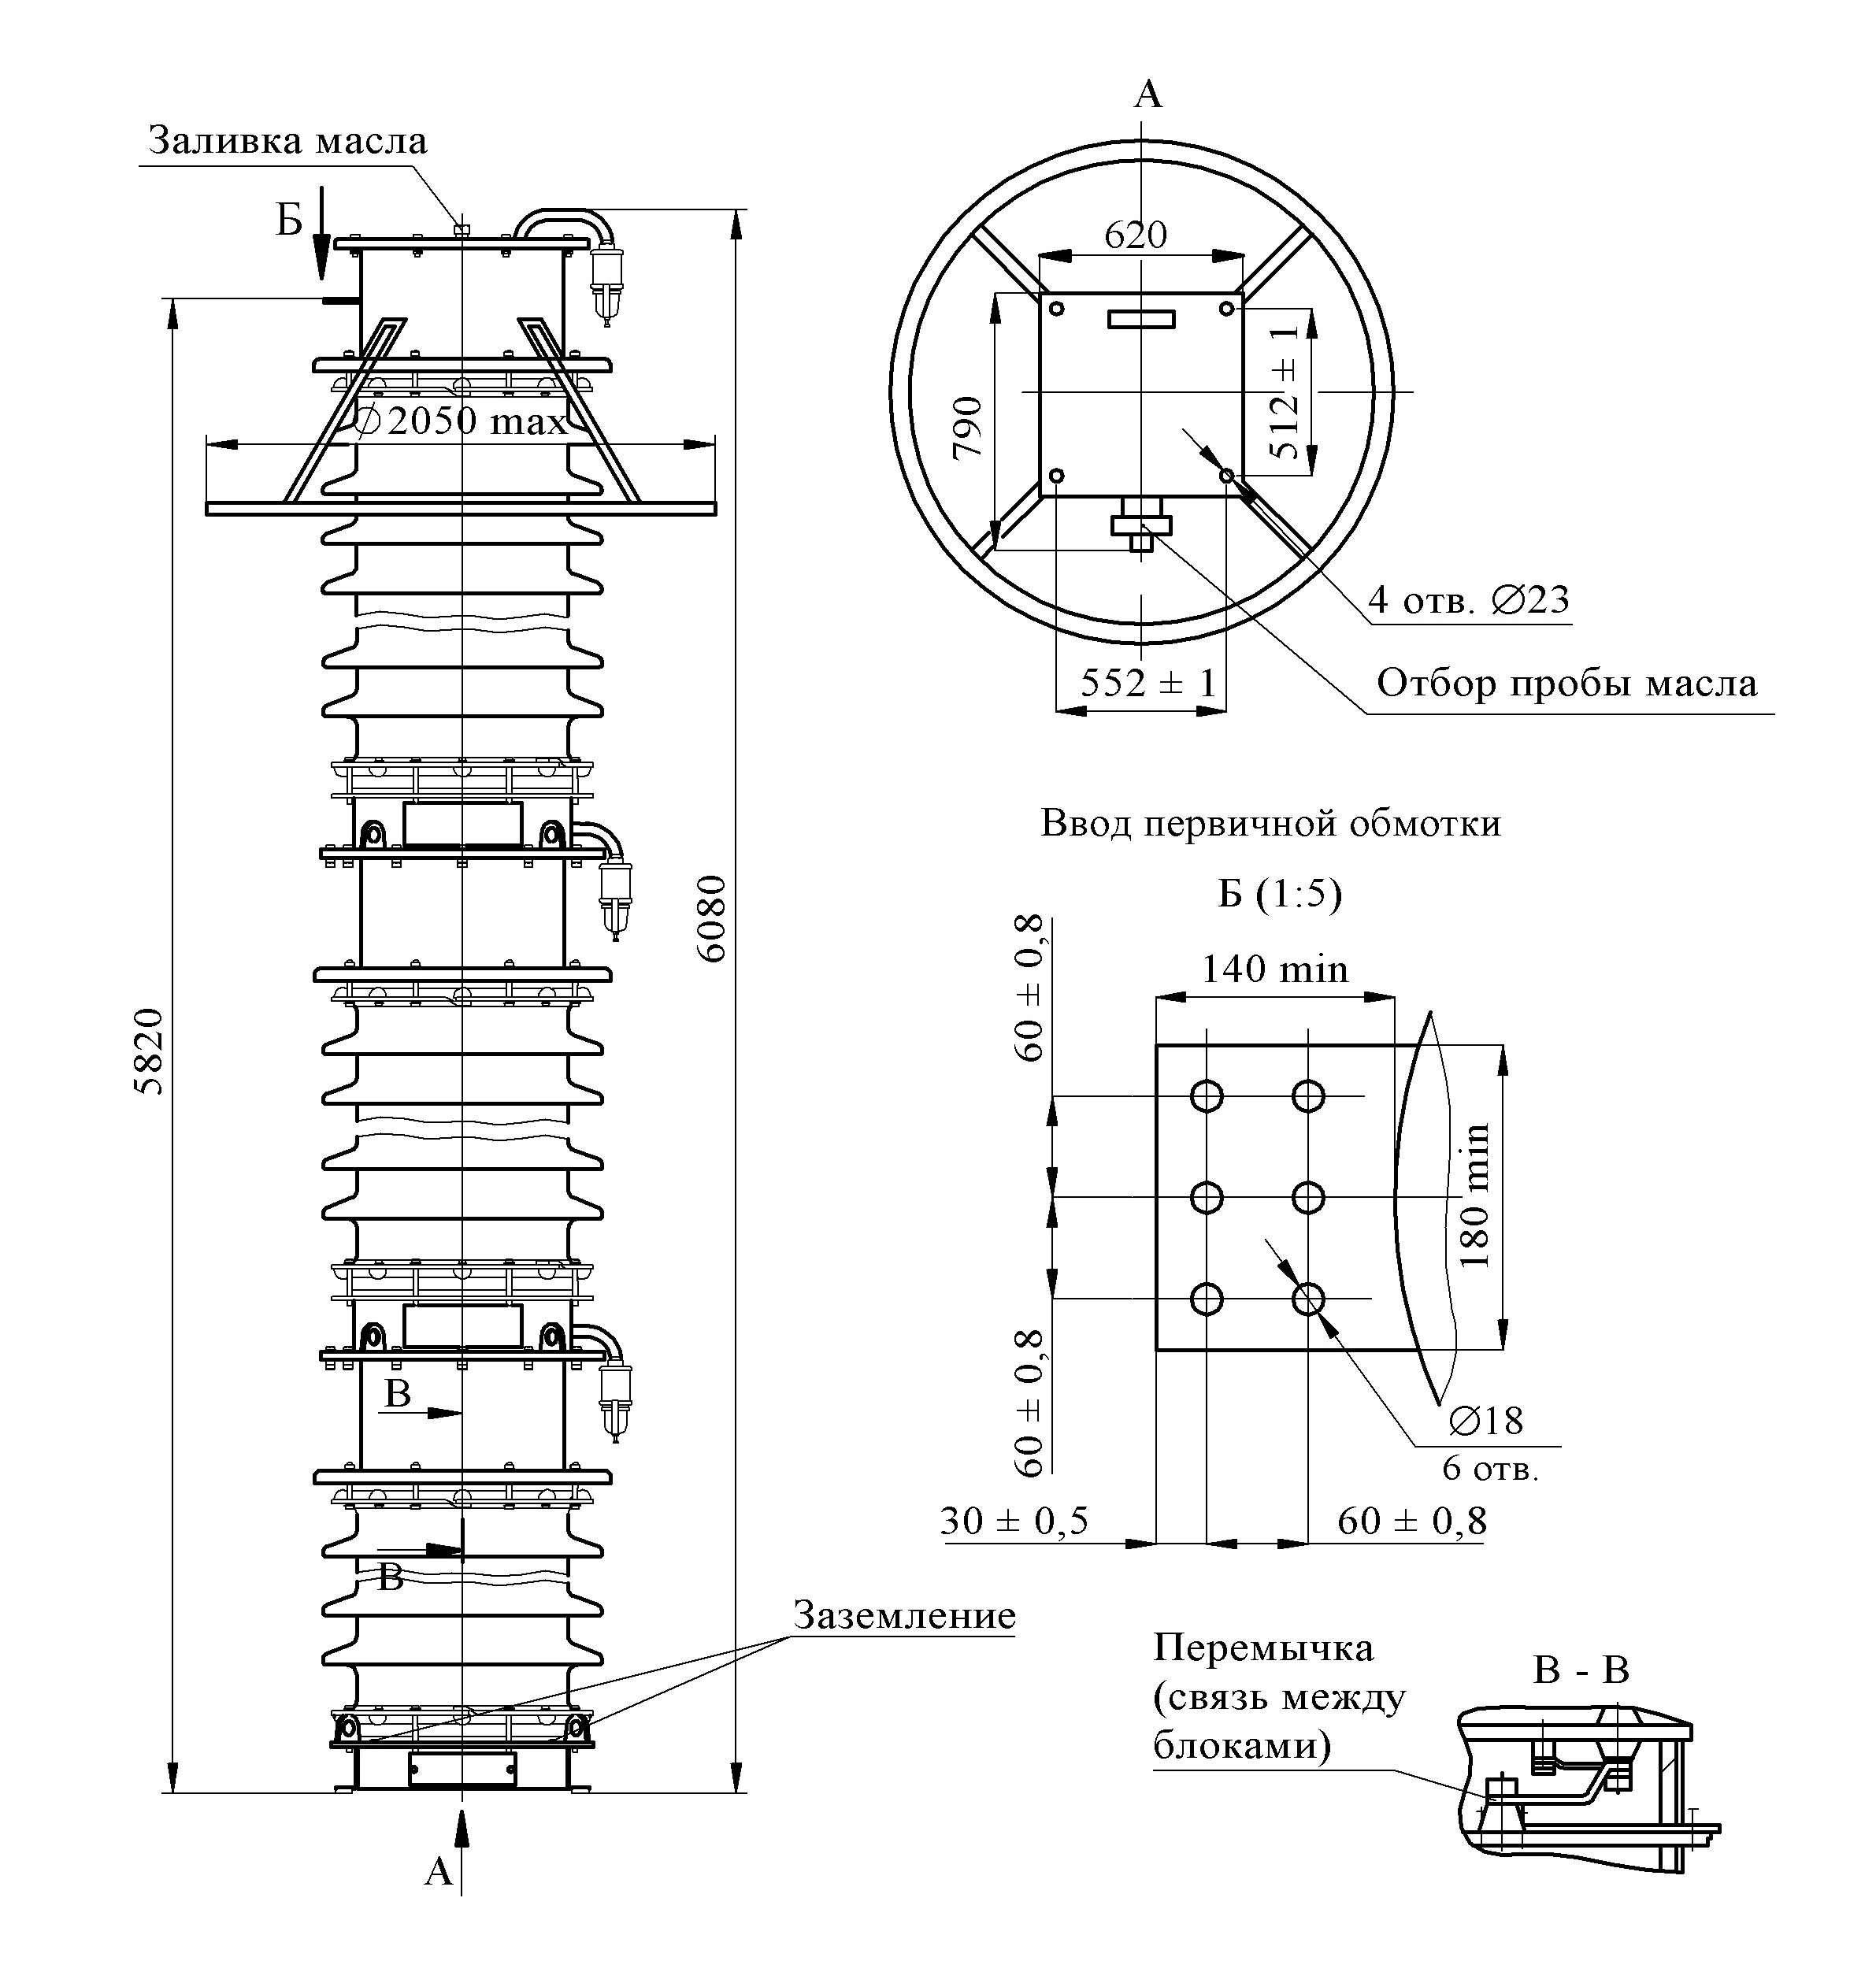 Трансформатор напряжения НКФ–М-400 I У1 (экспорт, класс точности 1,0)